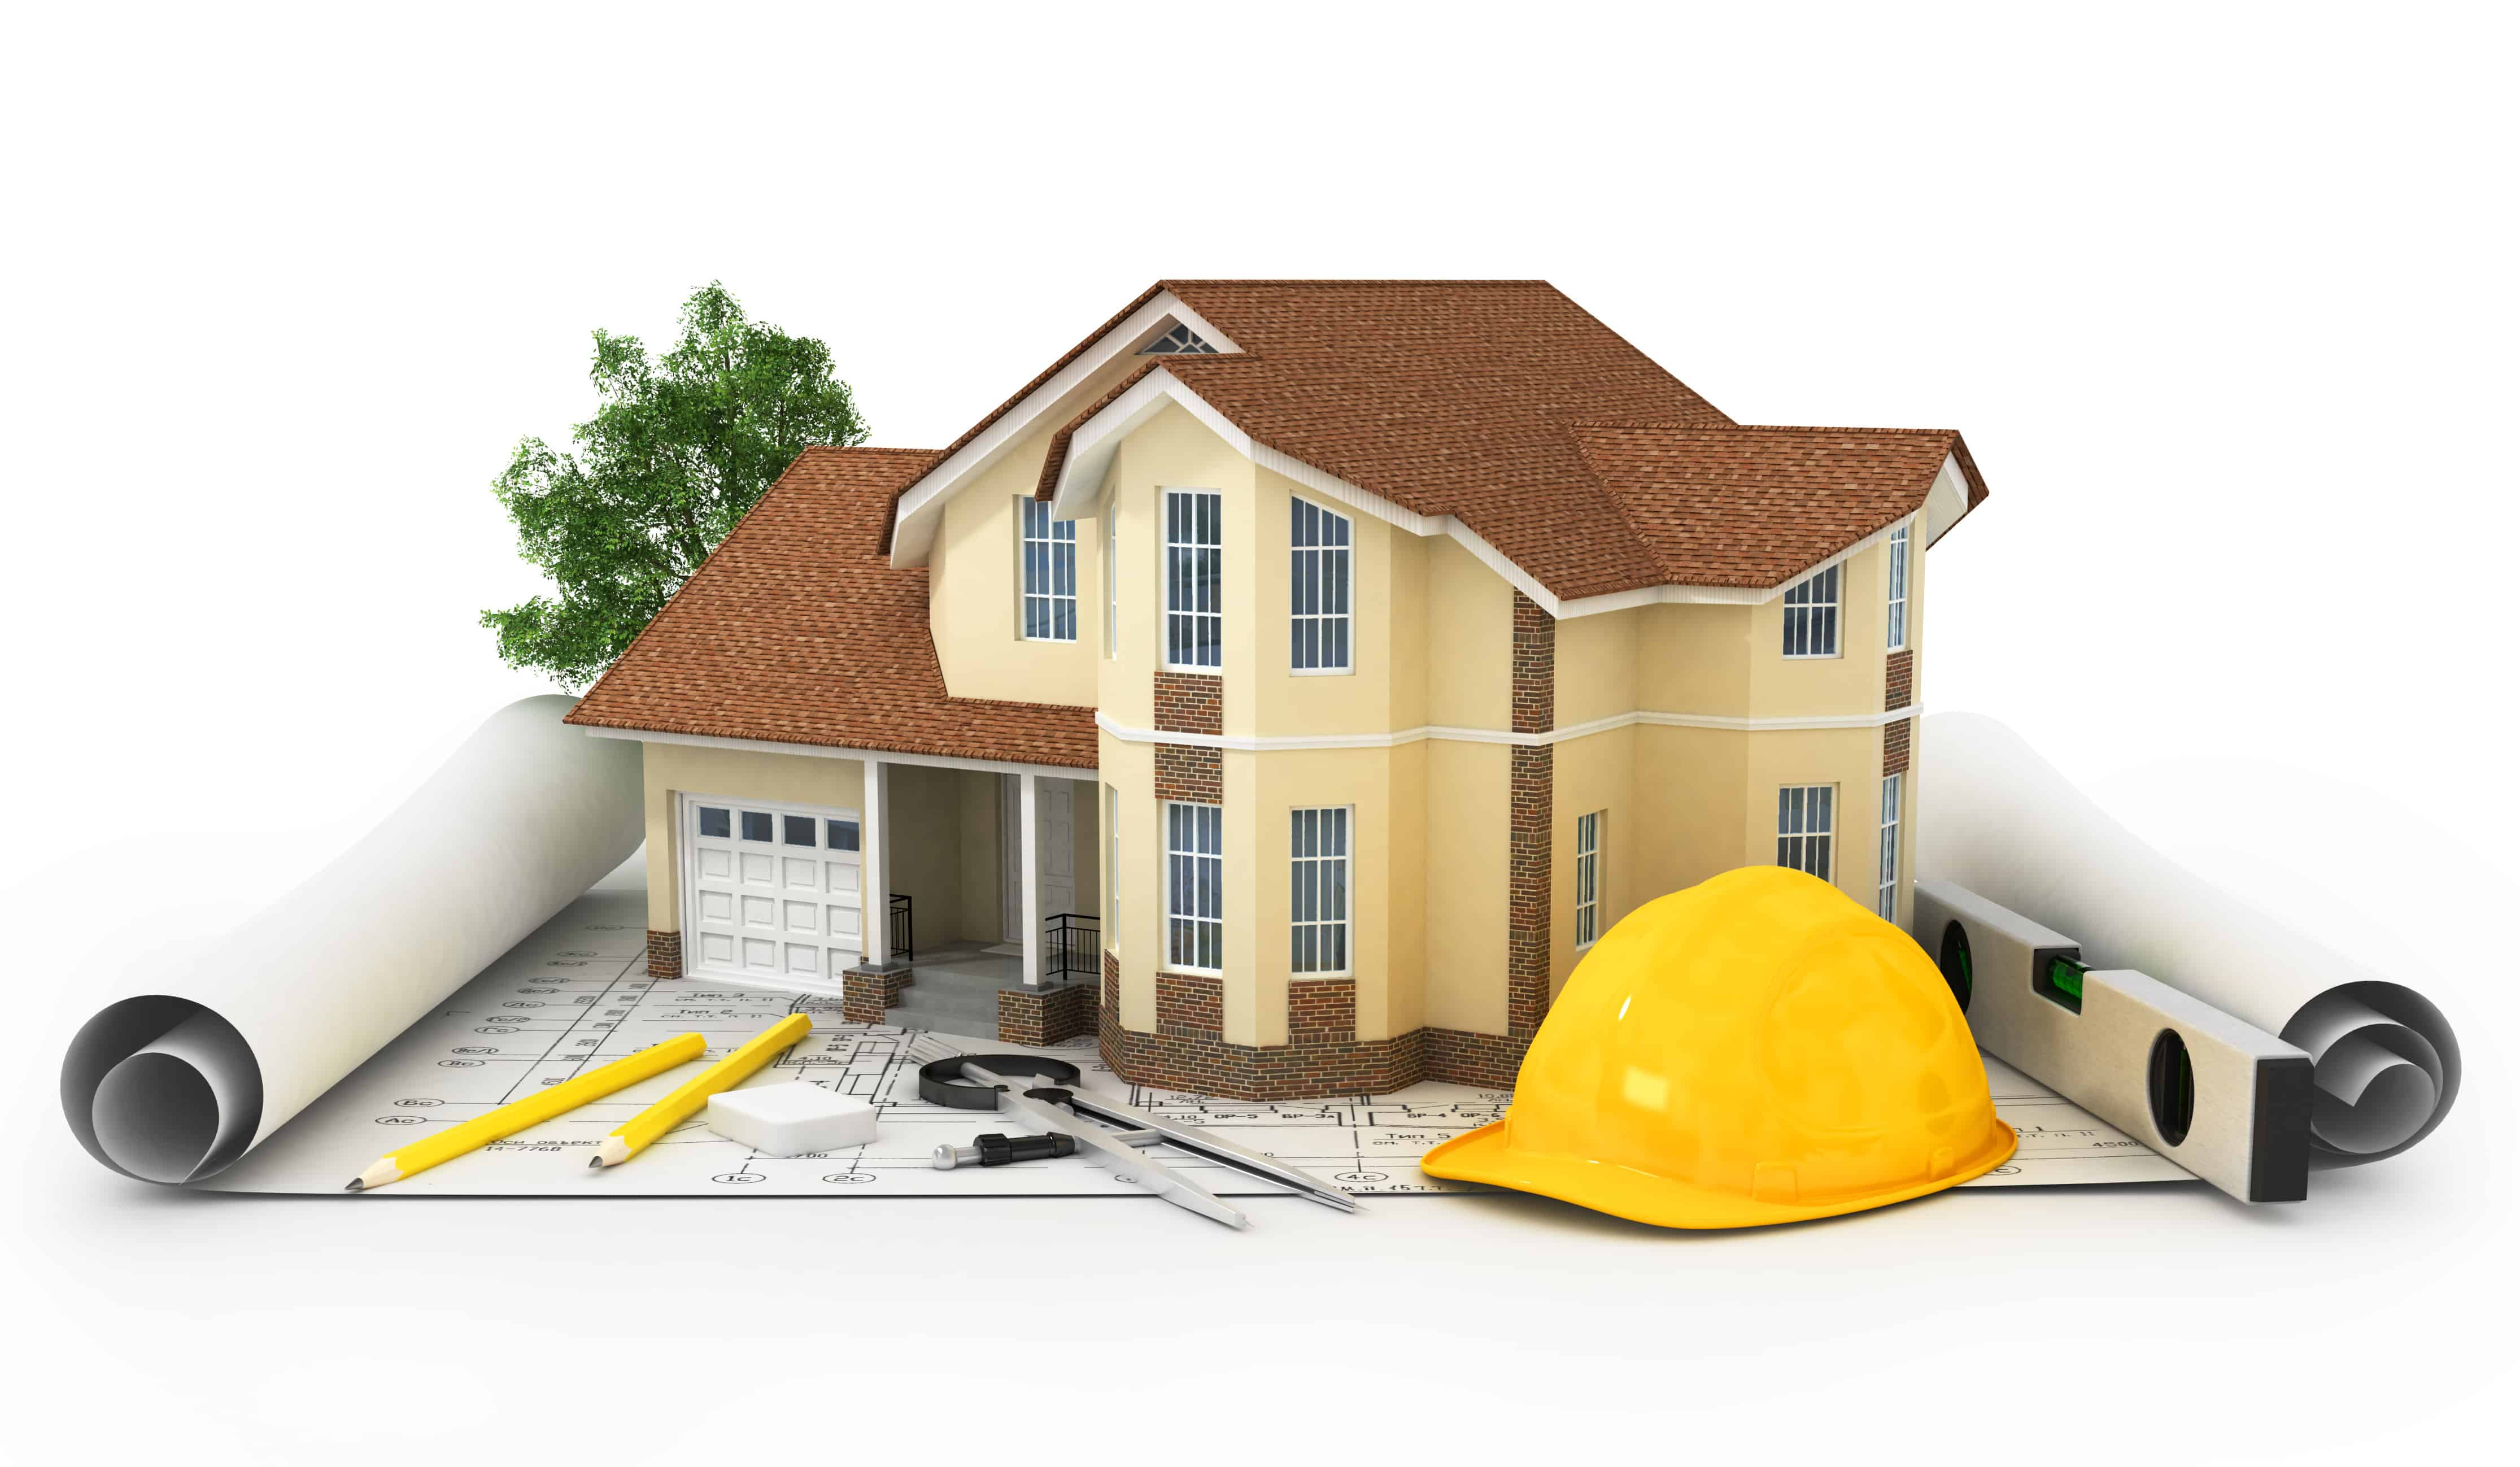 Home Improvement Contractor Gulfport   Alternative Medical Practice Around The World